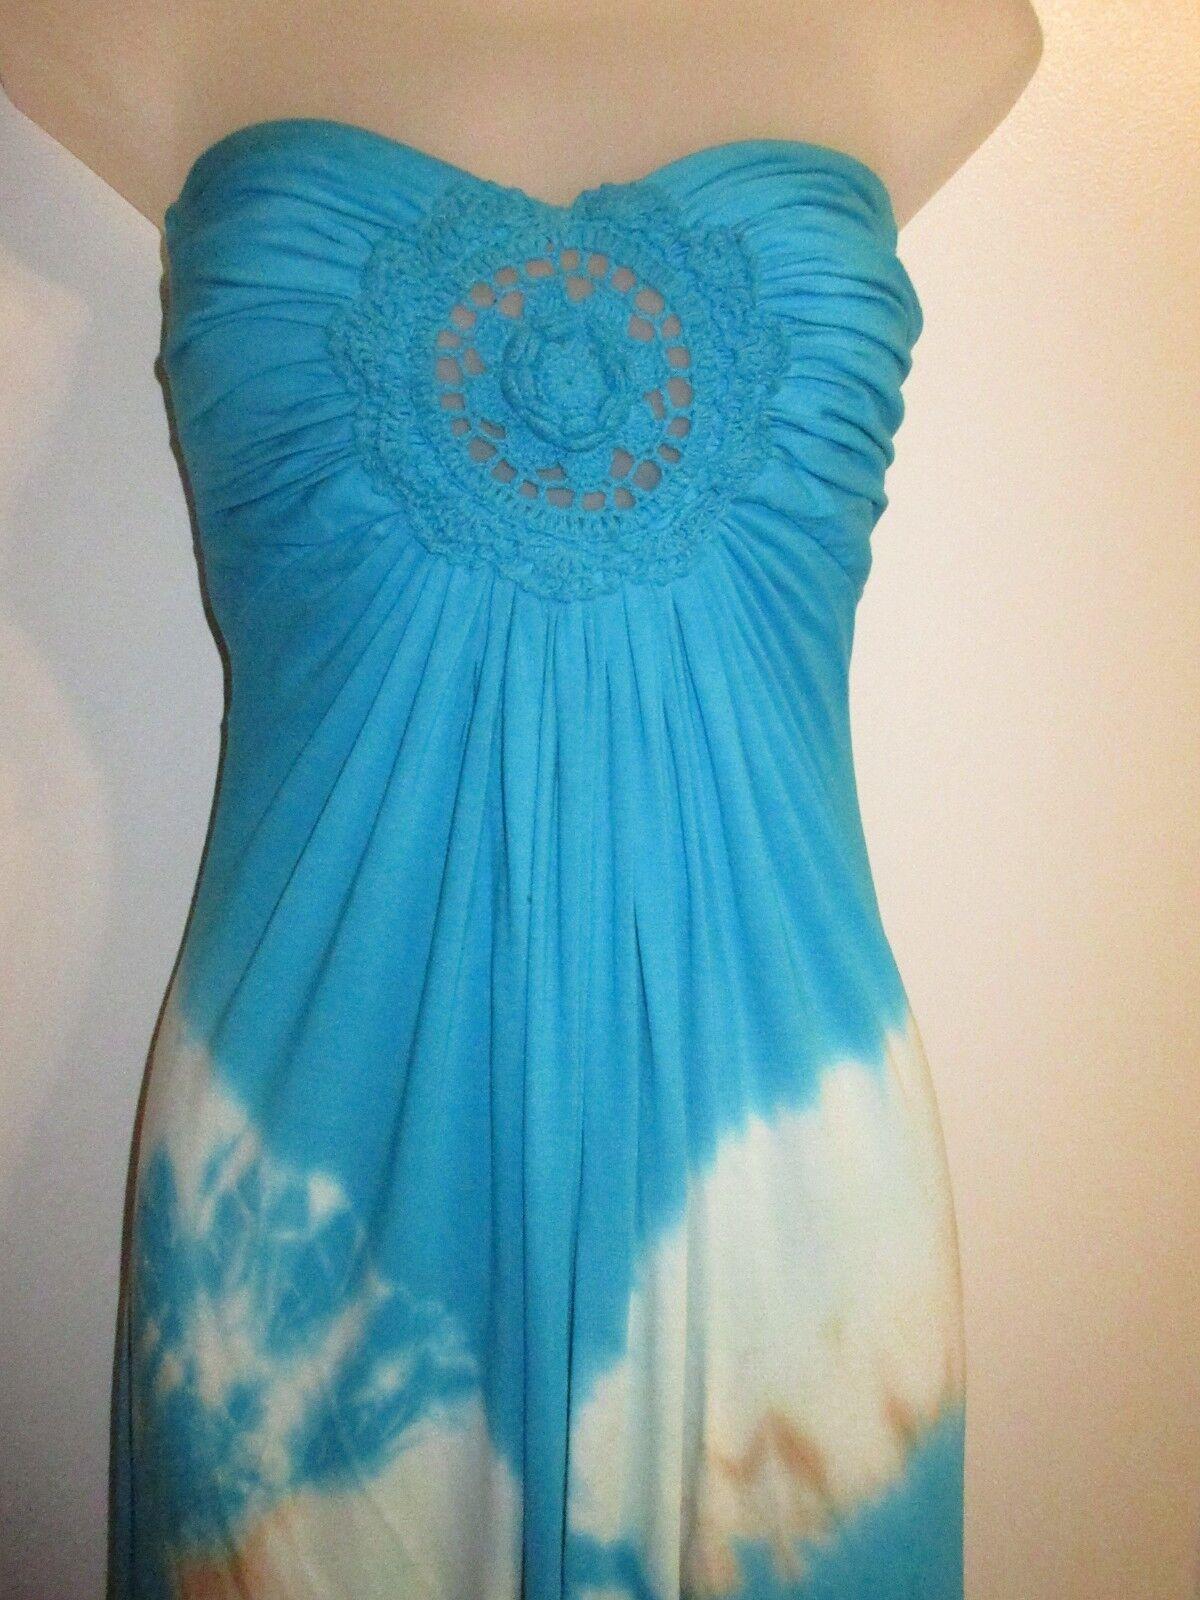 Sky Clothing Brand XS Maxi Dress Bright Blau Tie Dye Pattern Knit Crochet Beach